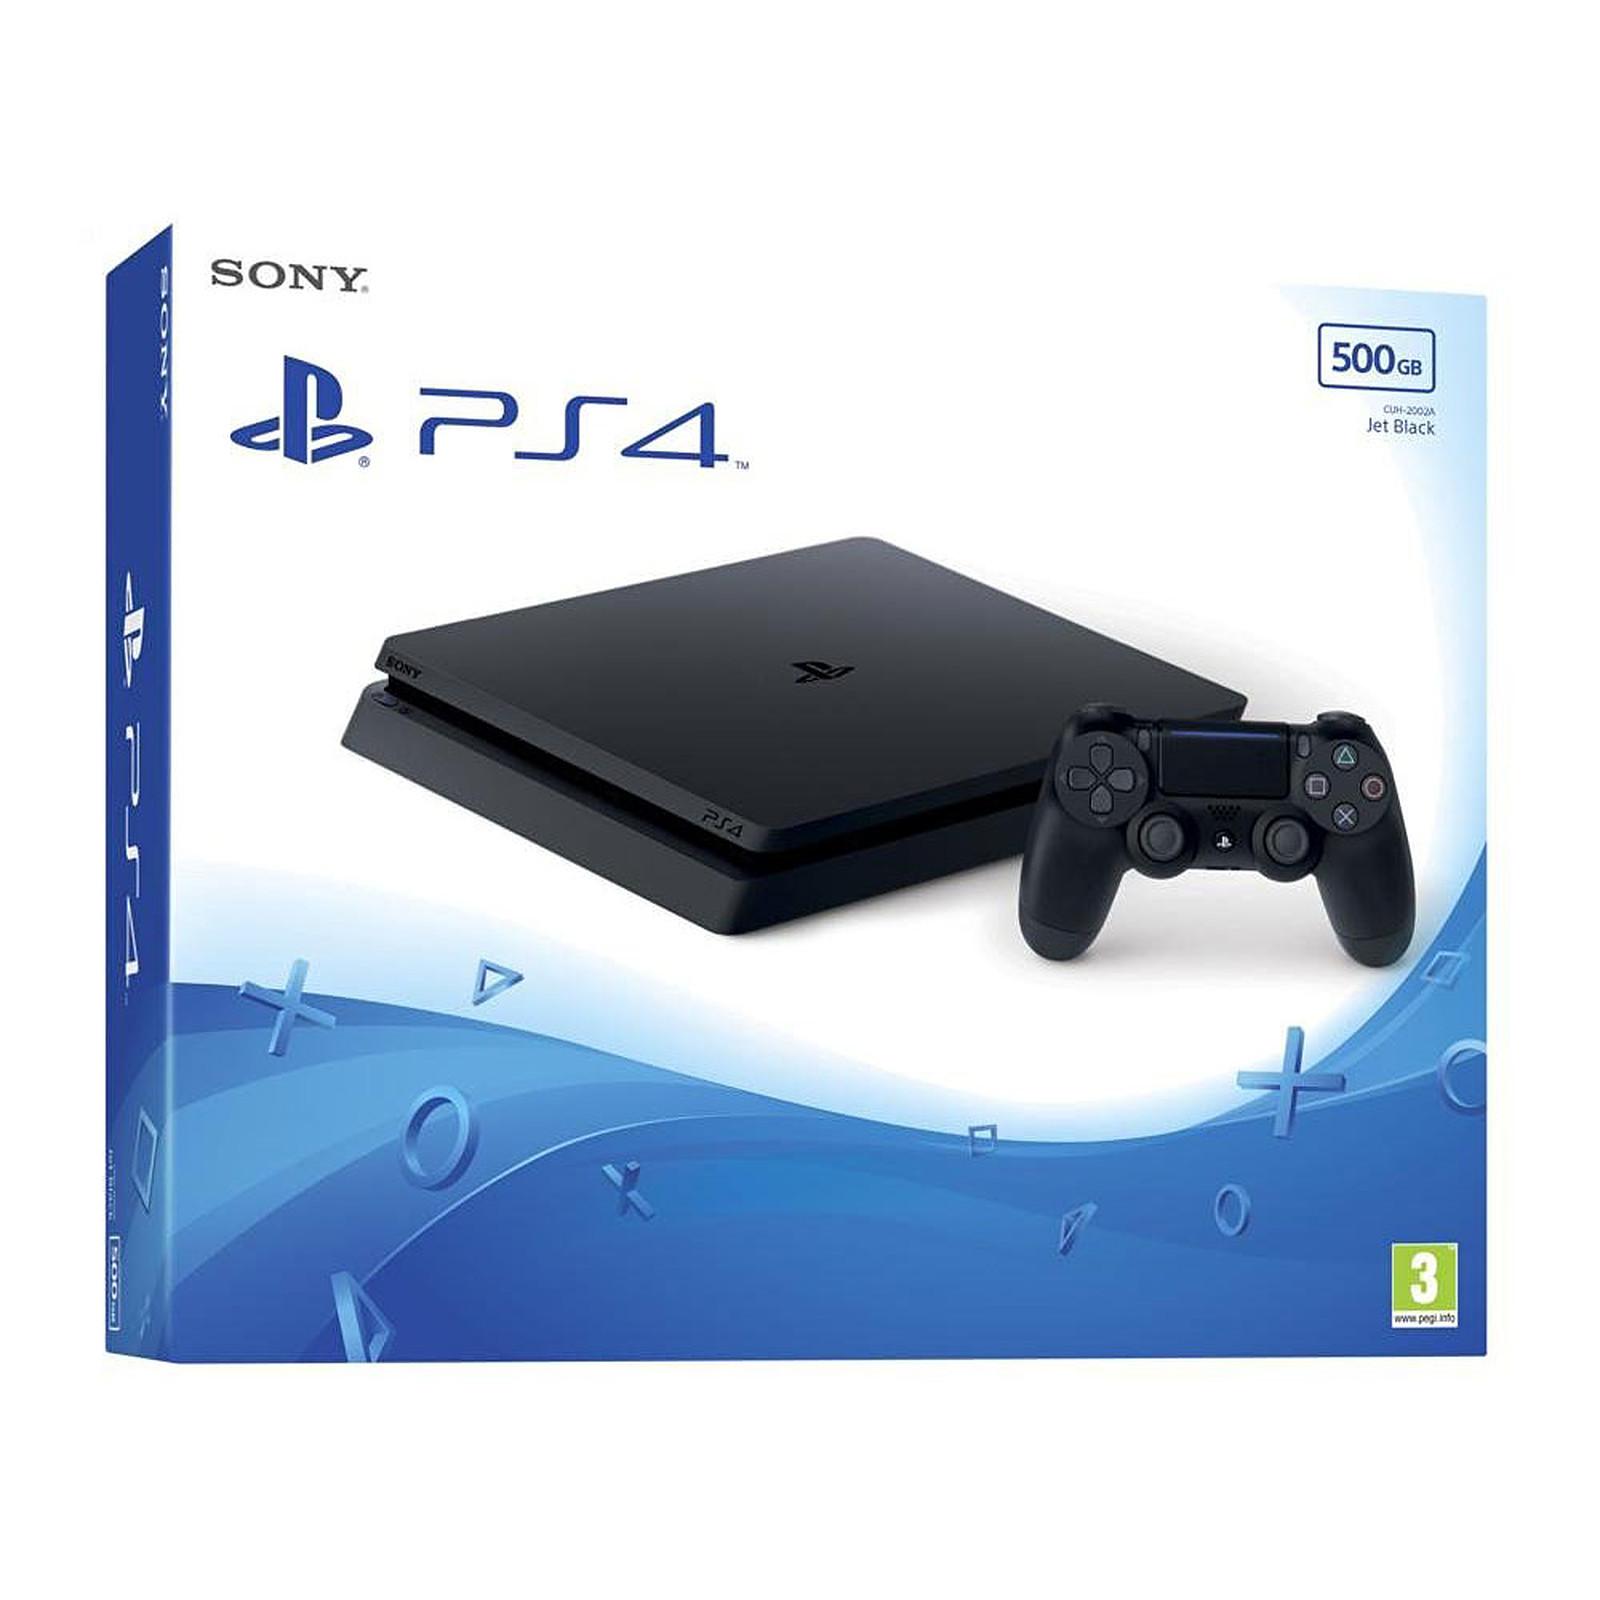 Sony PlayStation 4 Slim (500 GB) - Jet Black